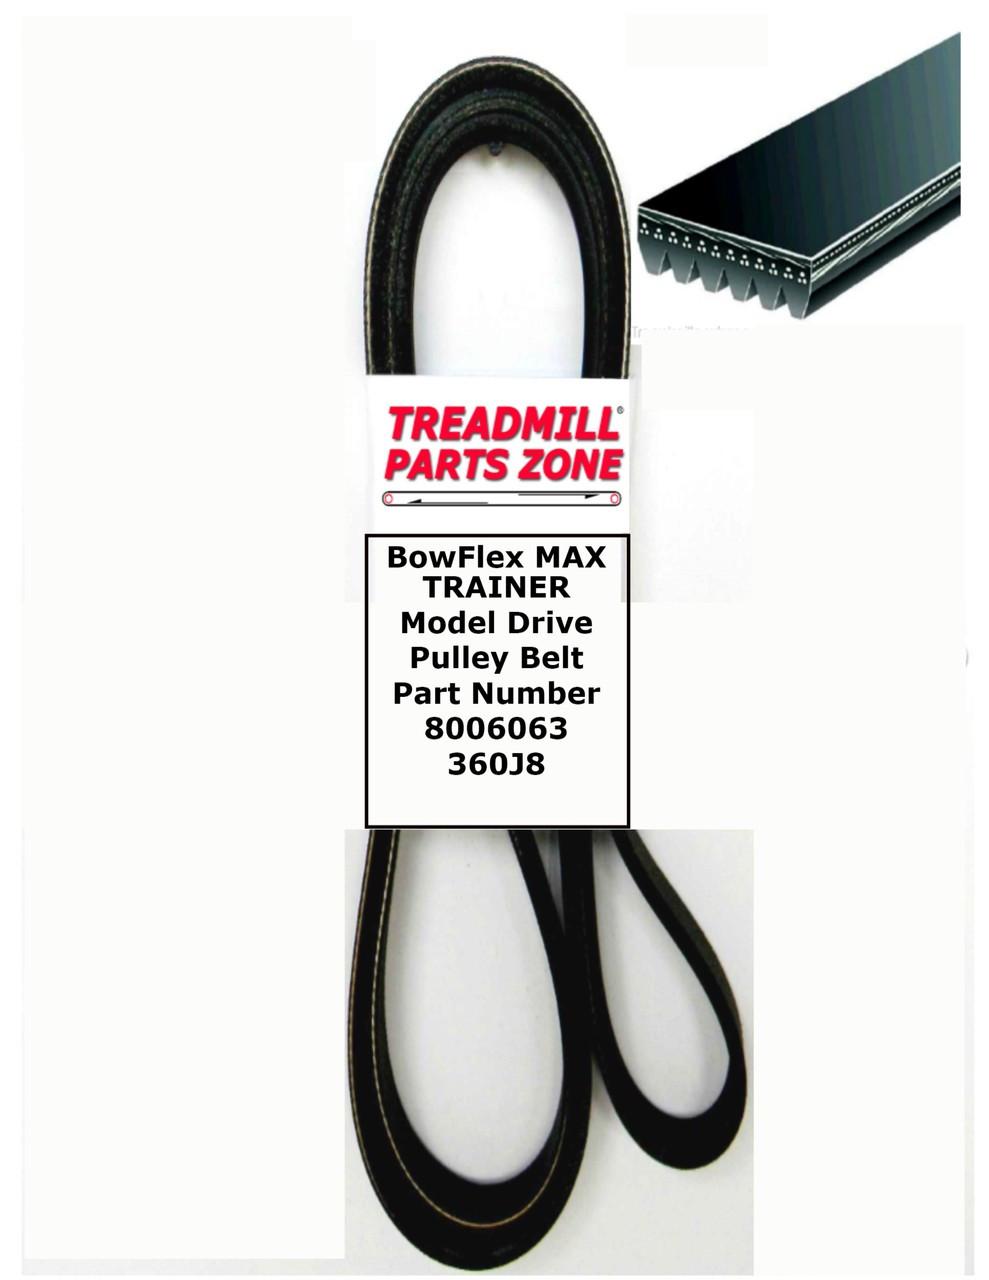 BowFlex Model MAX TRAINER M3 Drive Pulley Belt Part Number 8003146 360J8